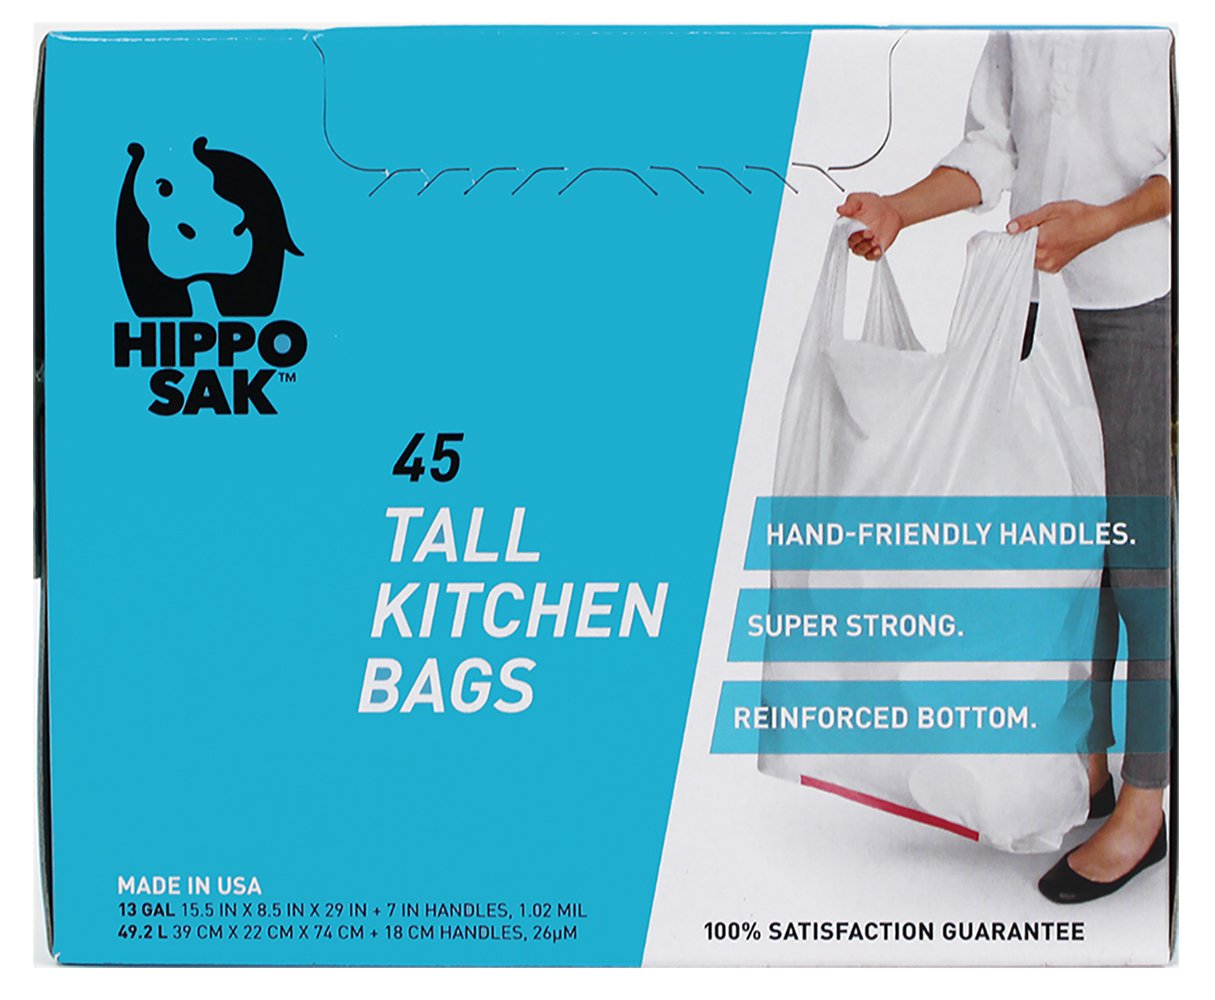 Hippo Sak 13 gallon tall kitchen trash